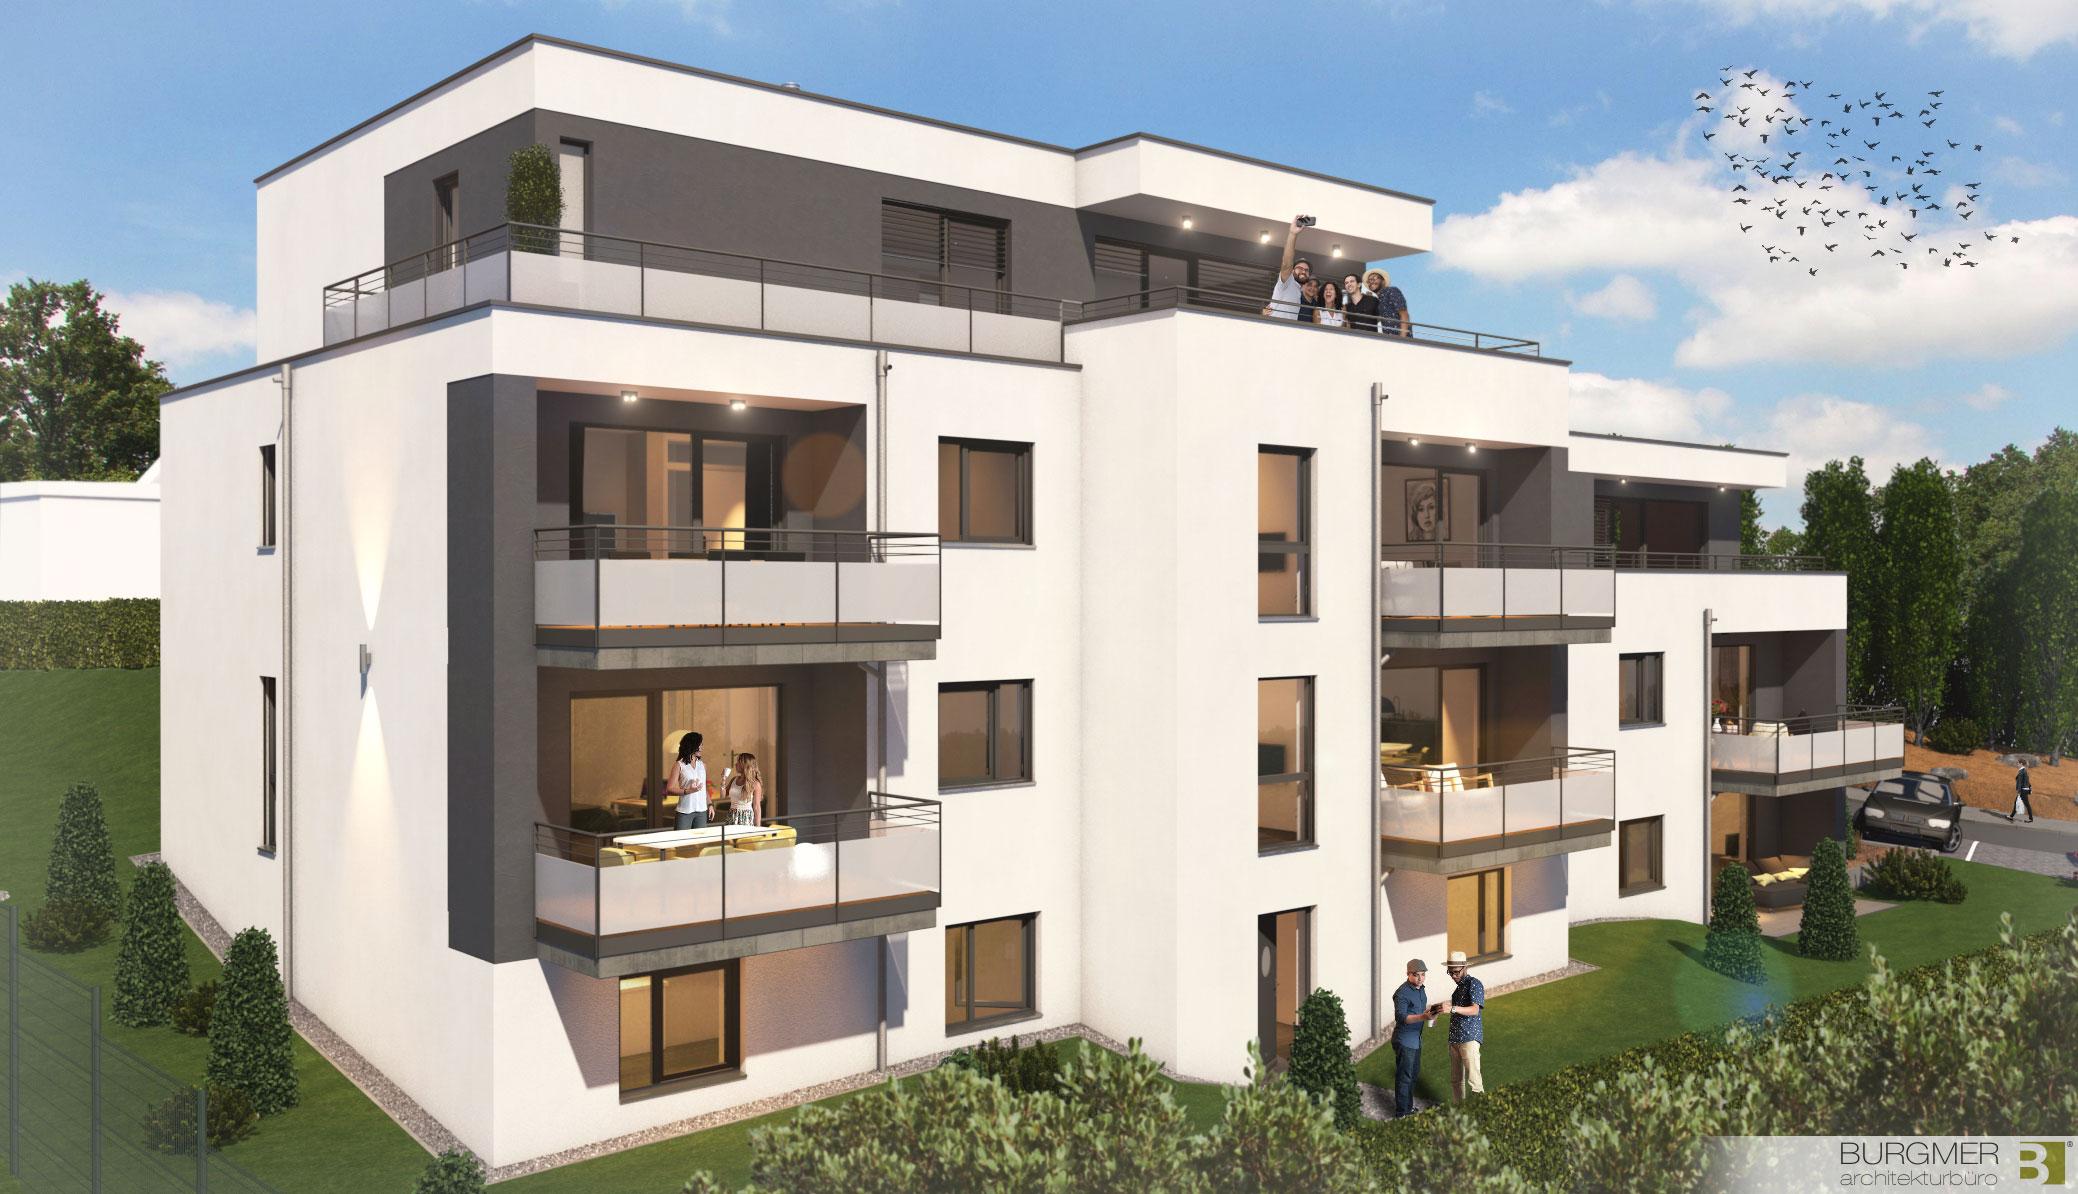 Architekt Bergisch Gladbach emejing architekten bergisch gladbach ideas kosherelsalvador com